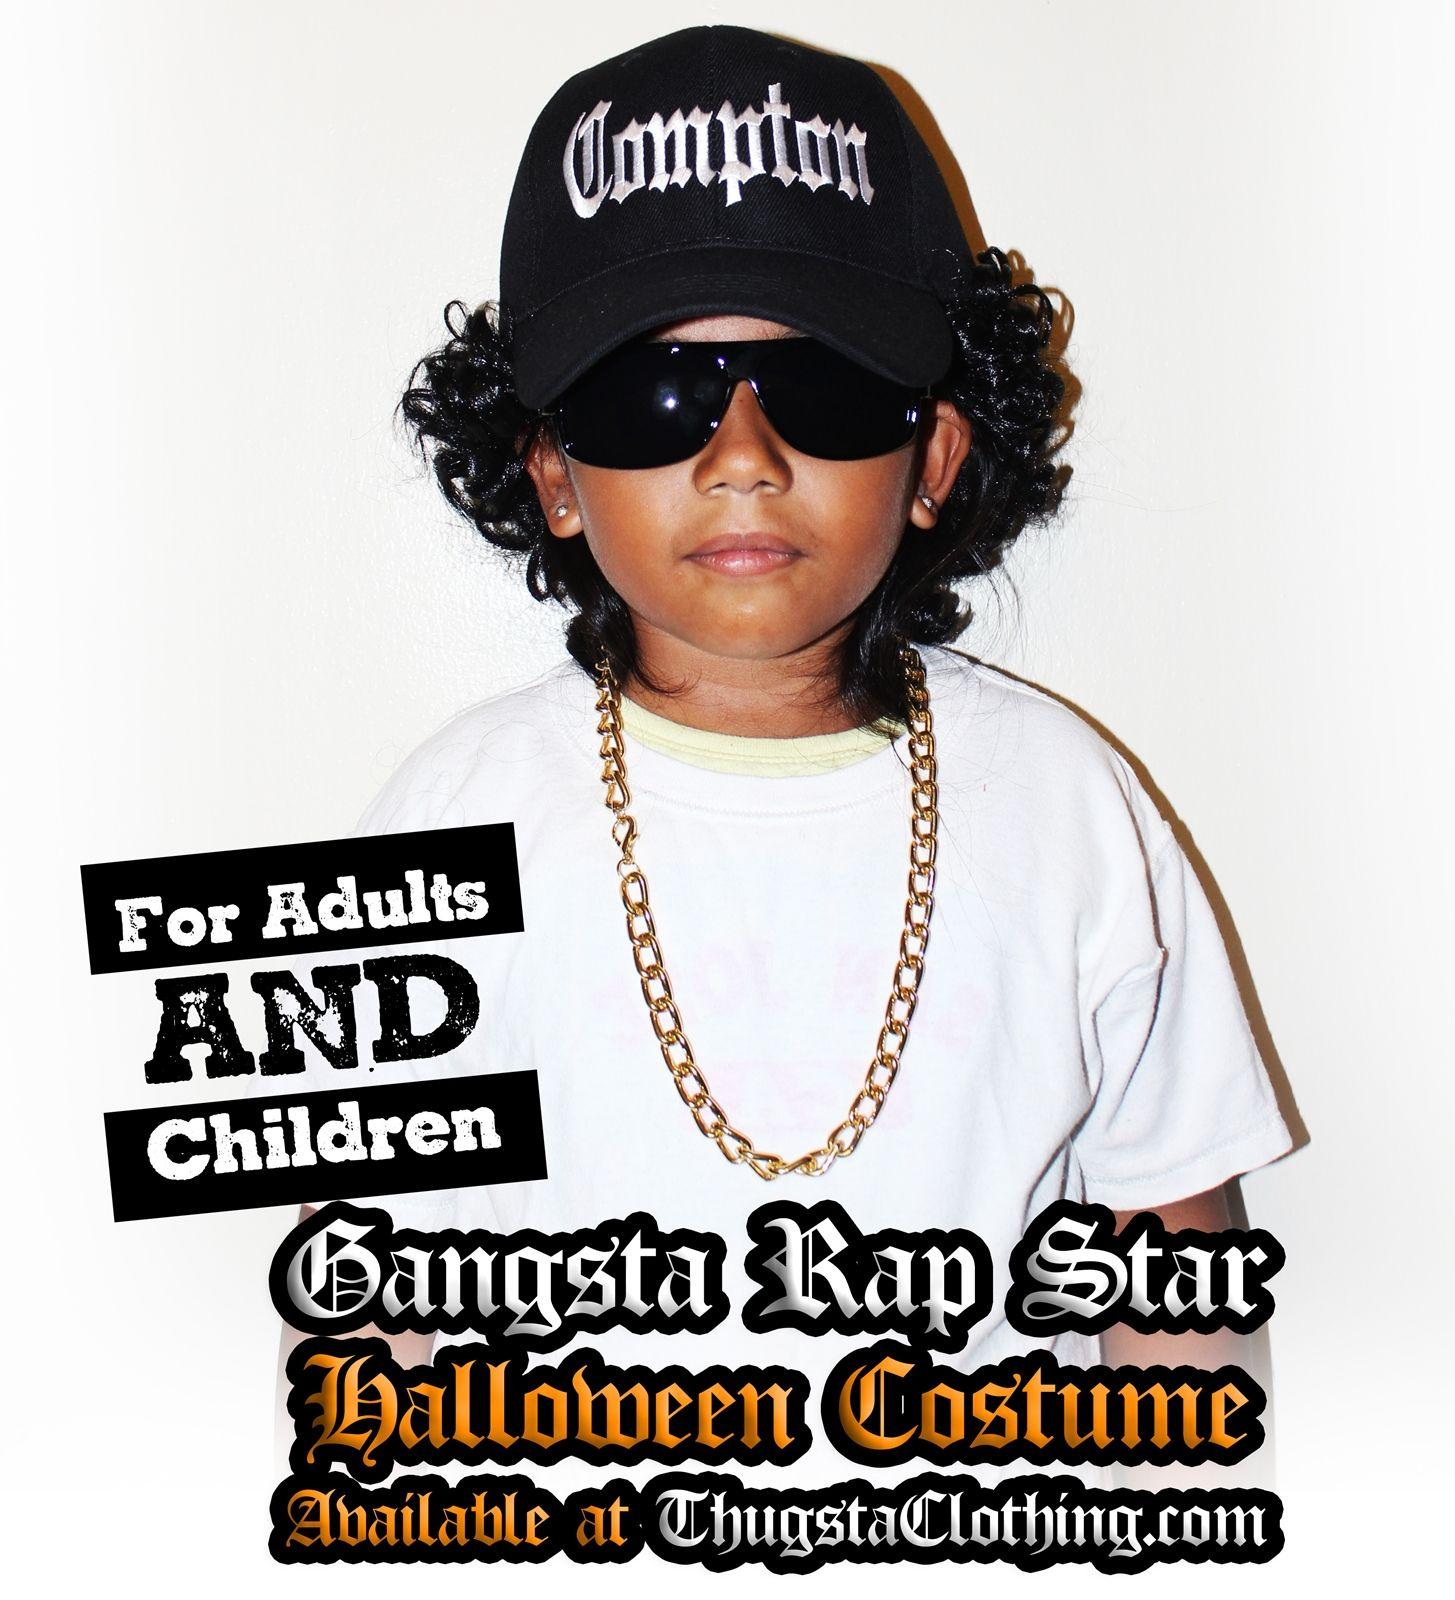 nwa gangsta rap star halloween costume eazy-e style   eazy-e costume